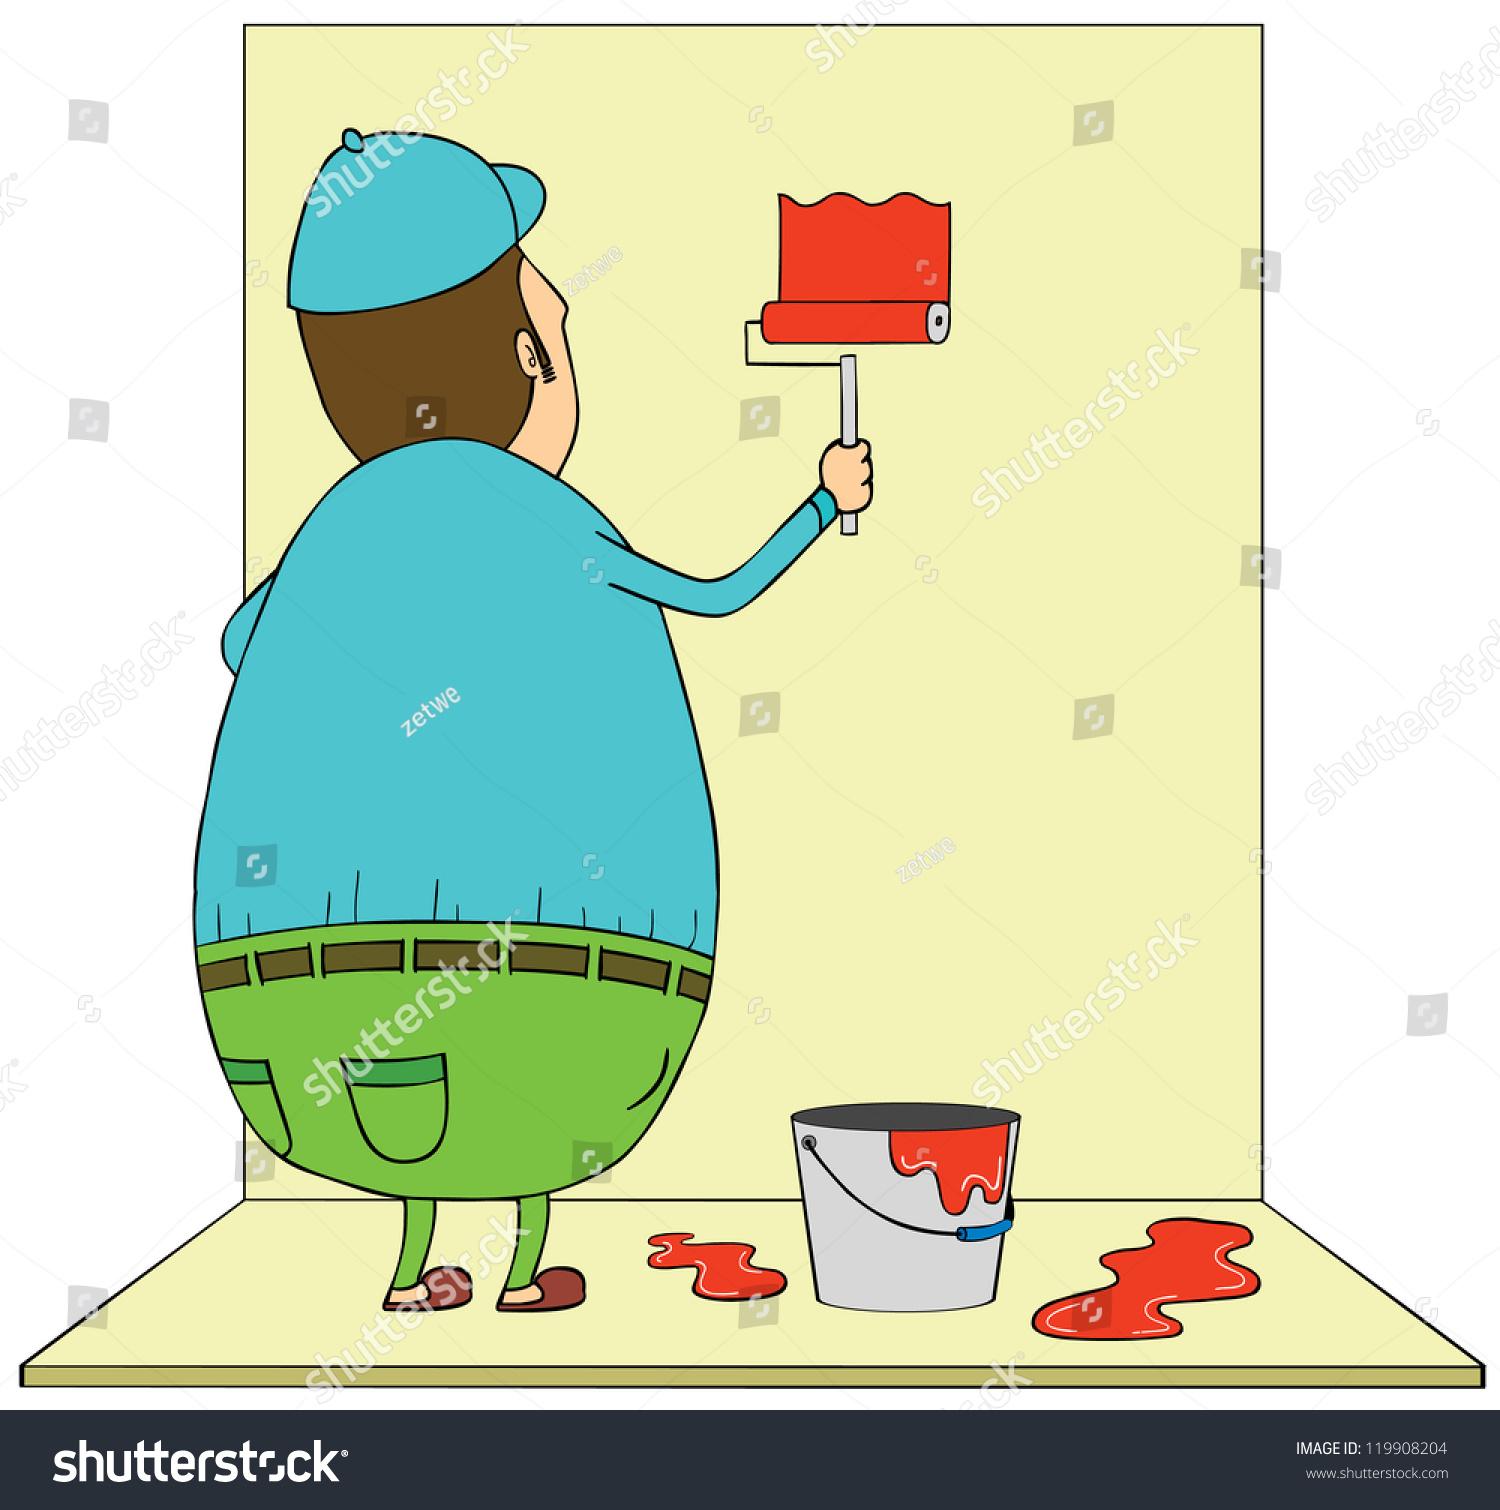 Fat Man Painting Wall Stock Vector 119908204 - Shutterstock